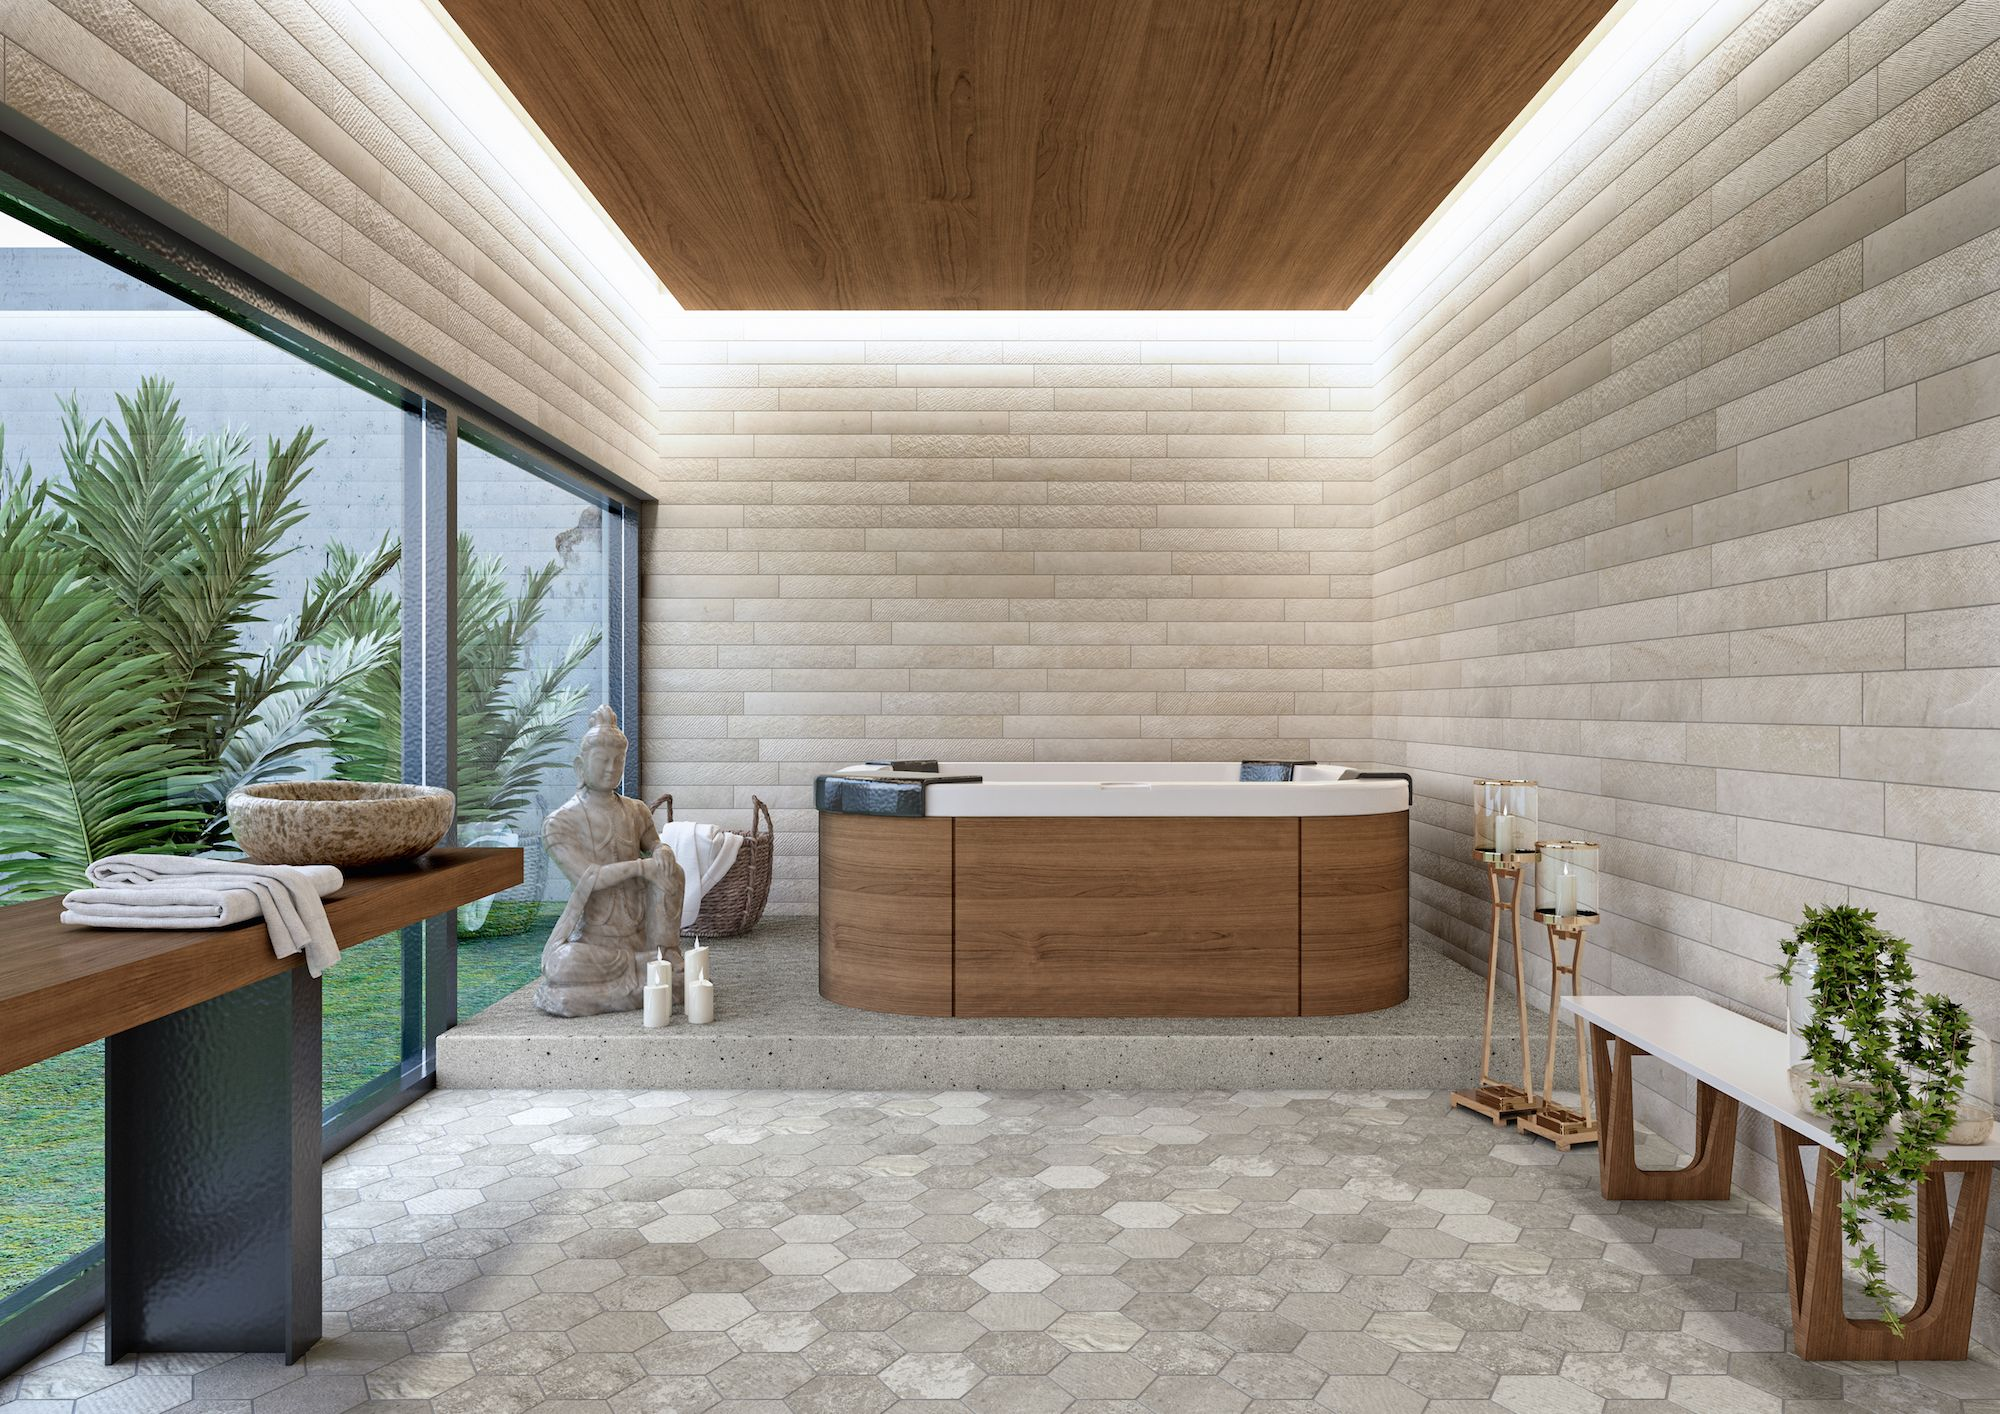 Prestige By Mac 3 In 2020 Bathroom Accent Wall Bathroom Accents Accent Wall